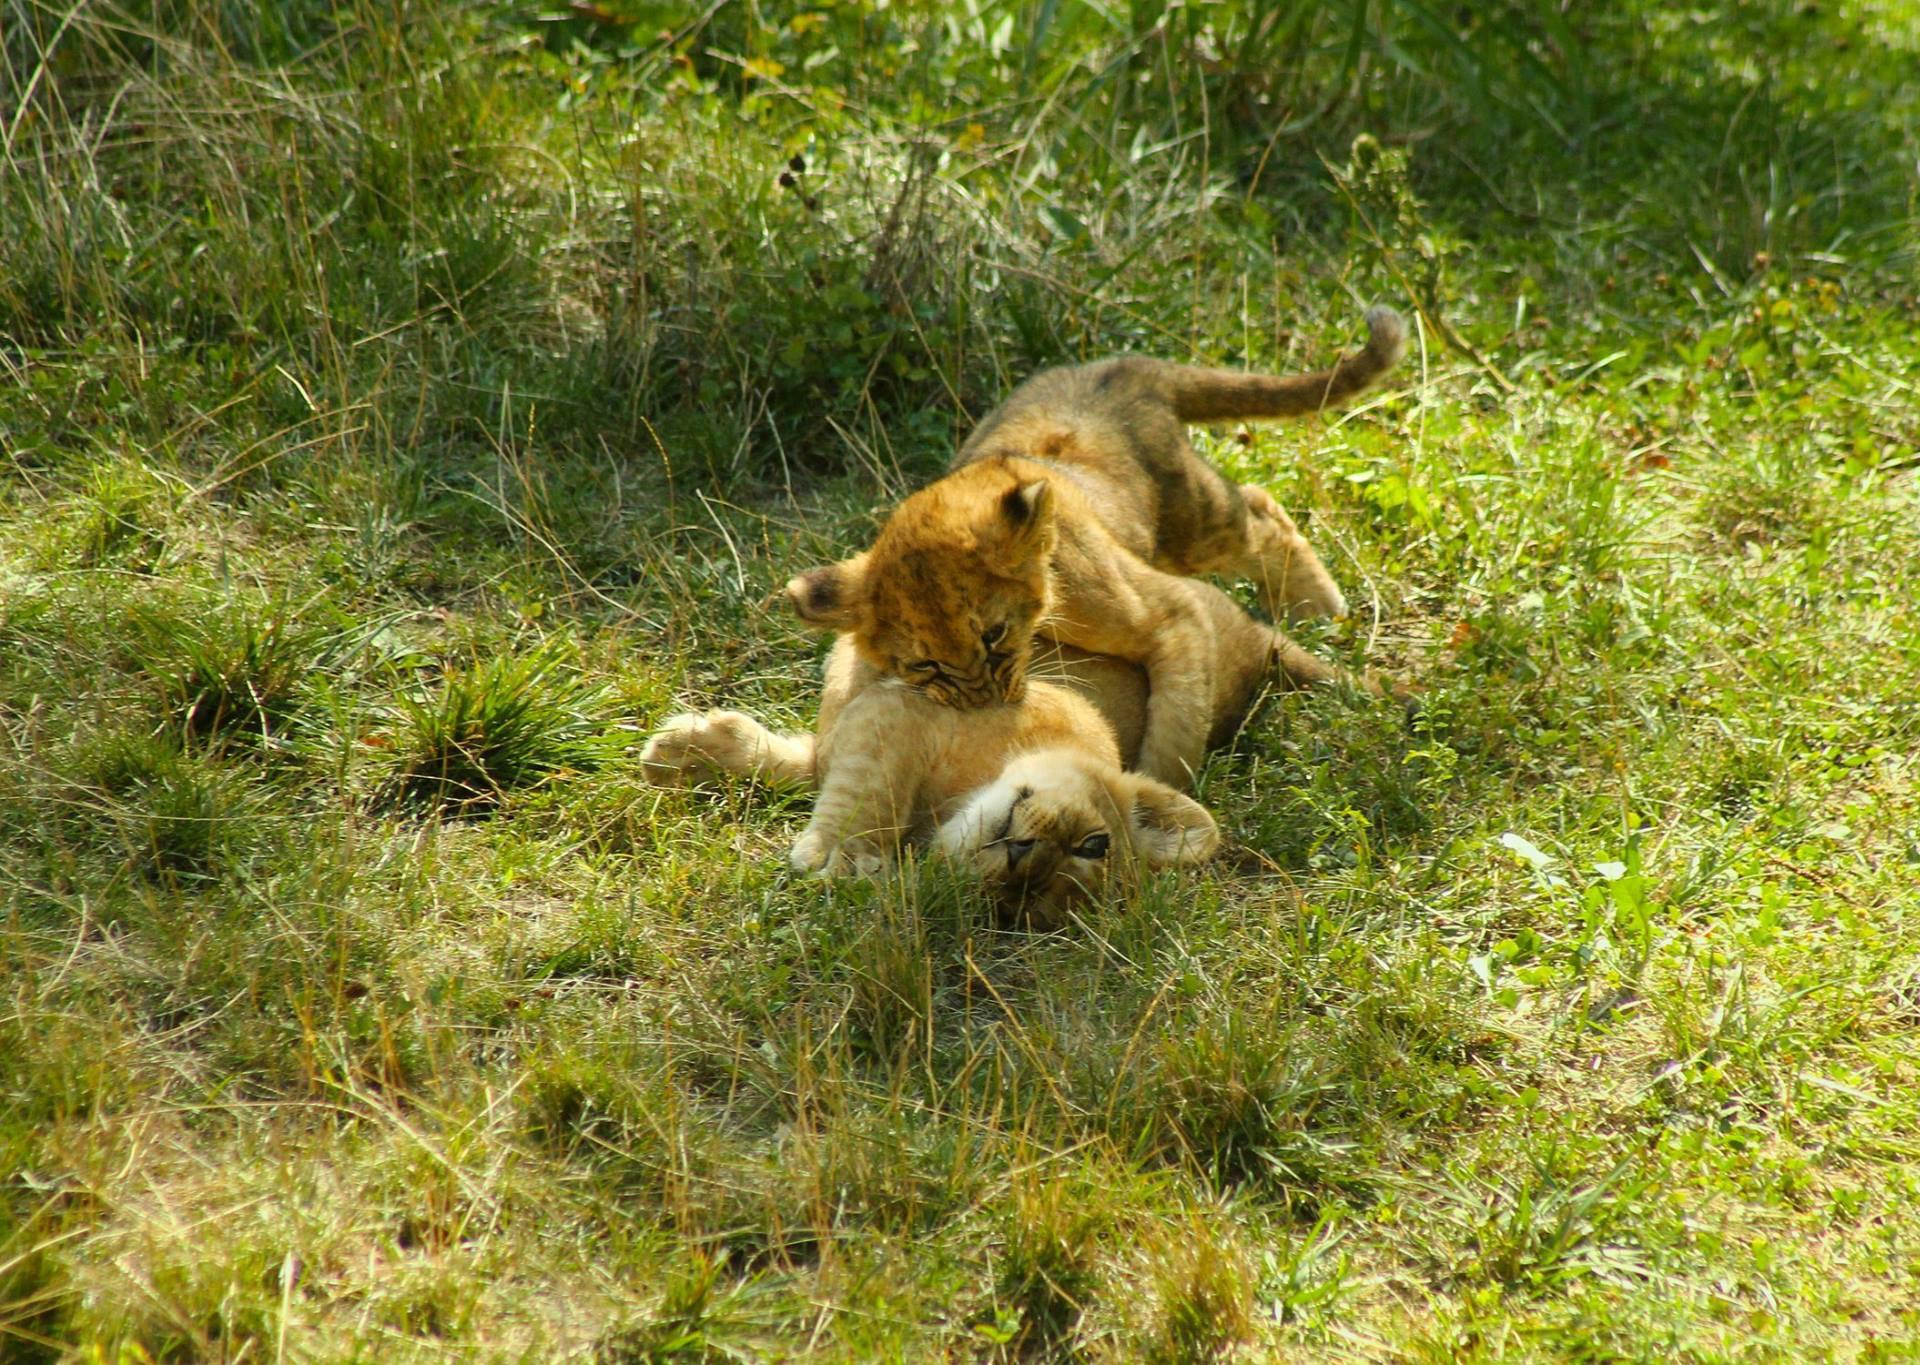 Mladi lavlji prinčevi izašli su na ljetno sunce kako bi se poigrali